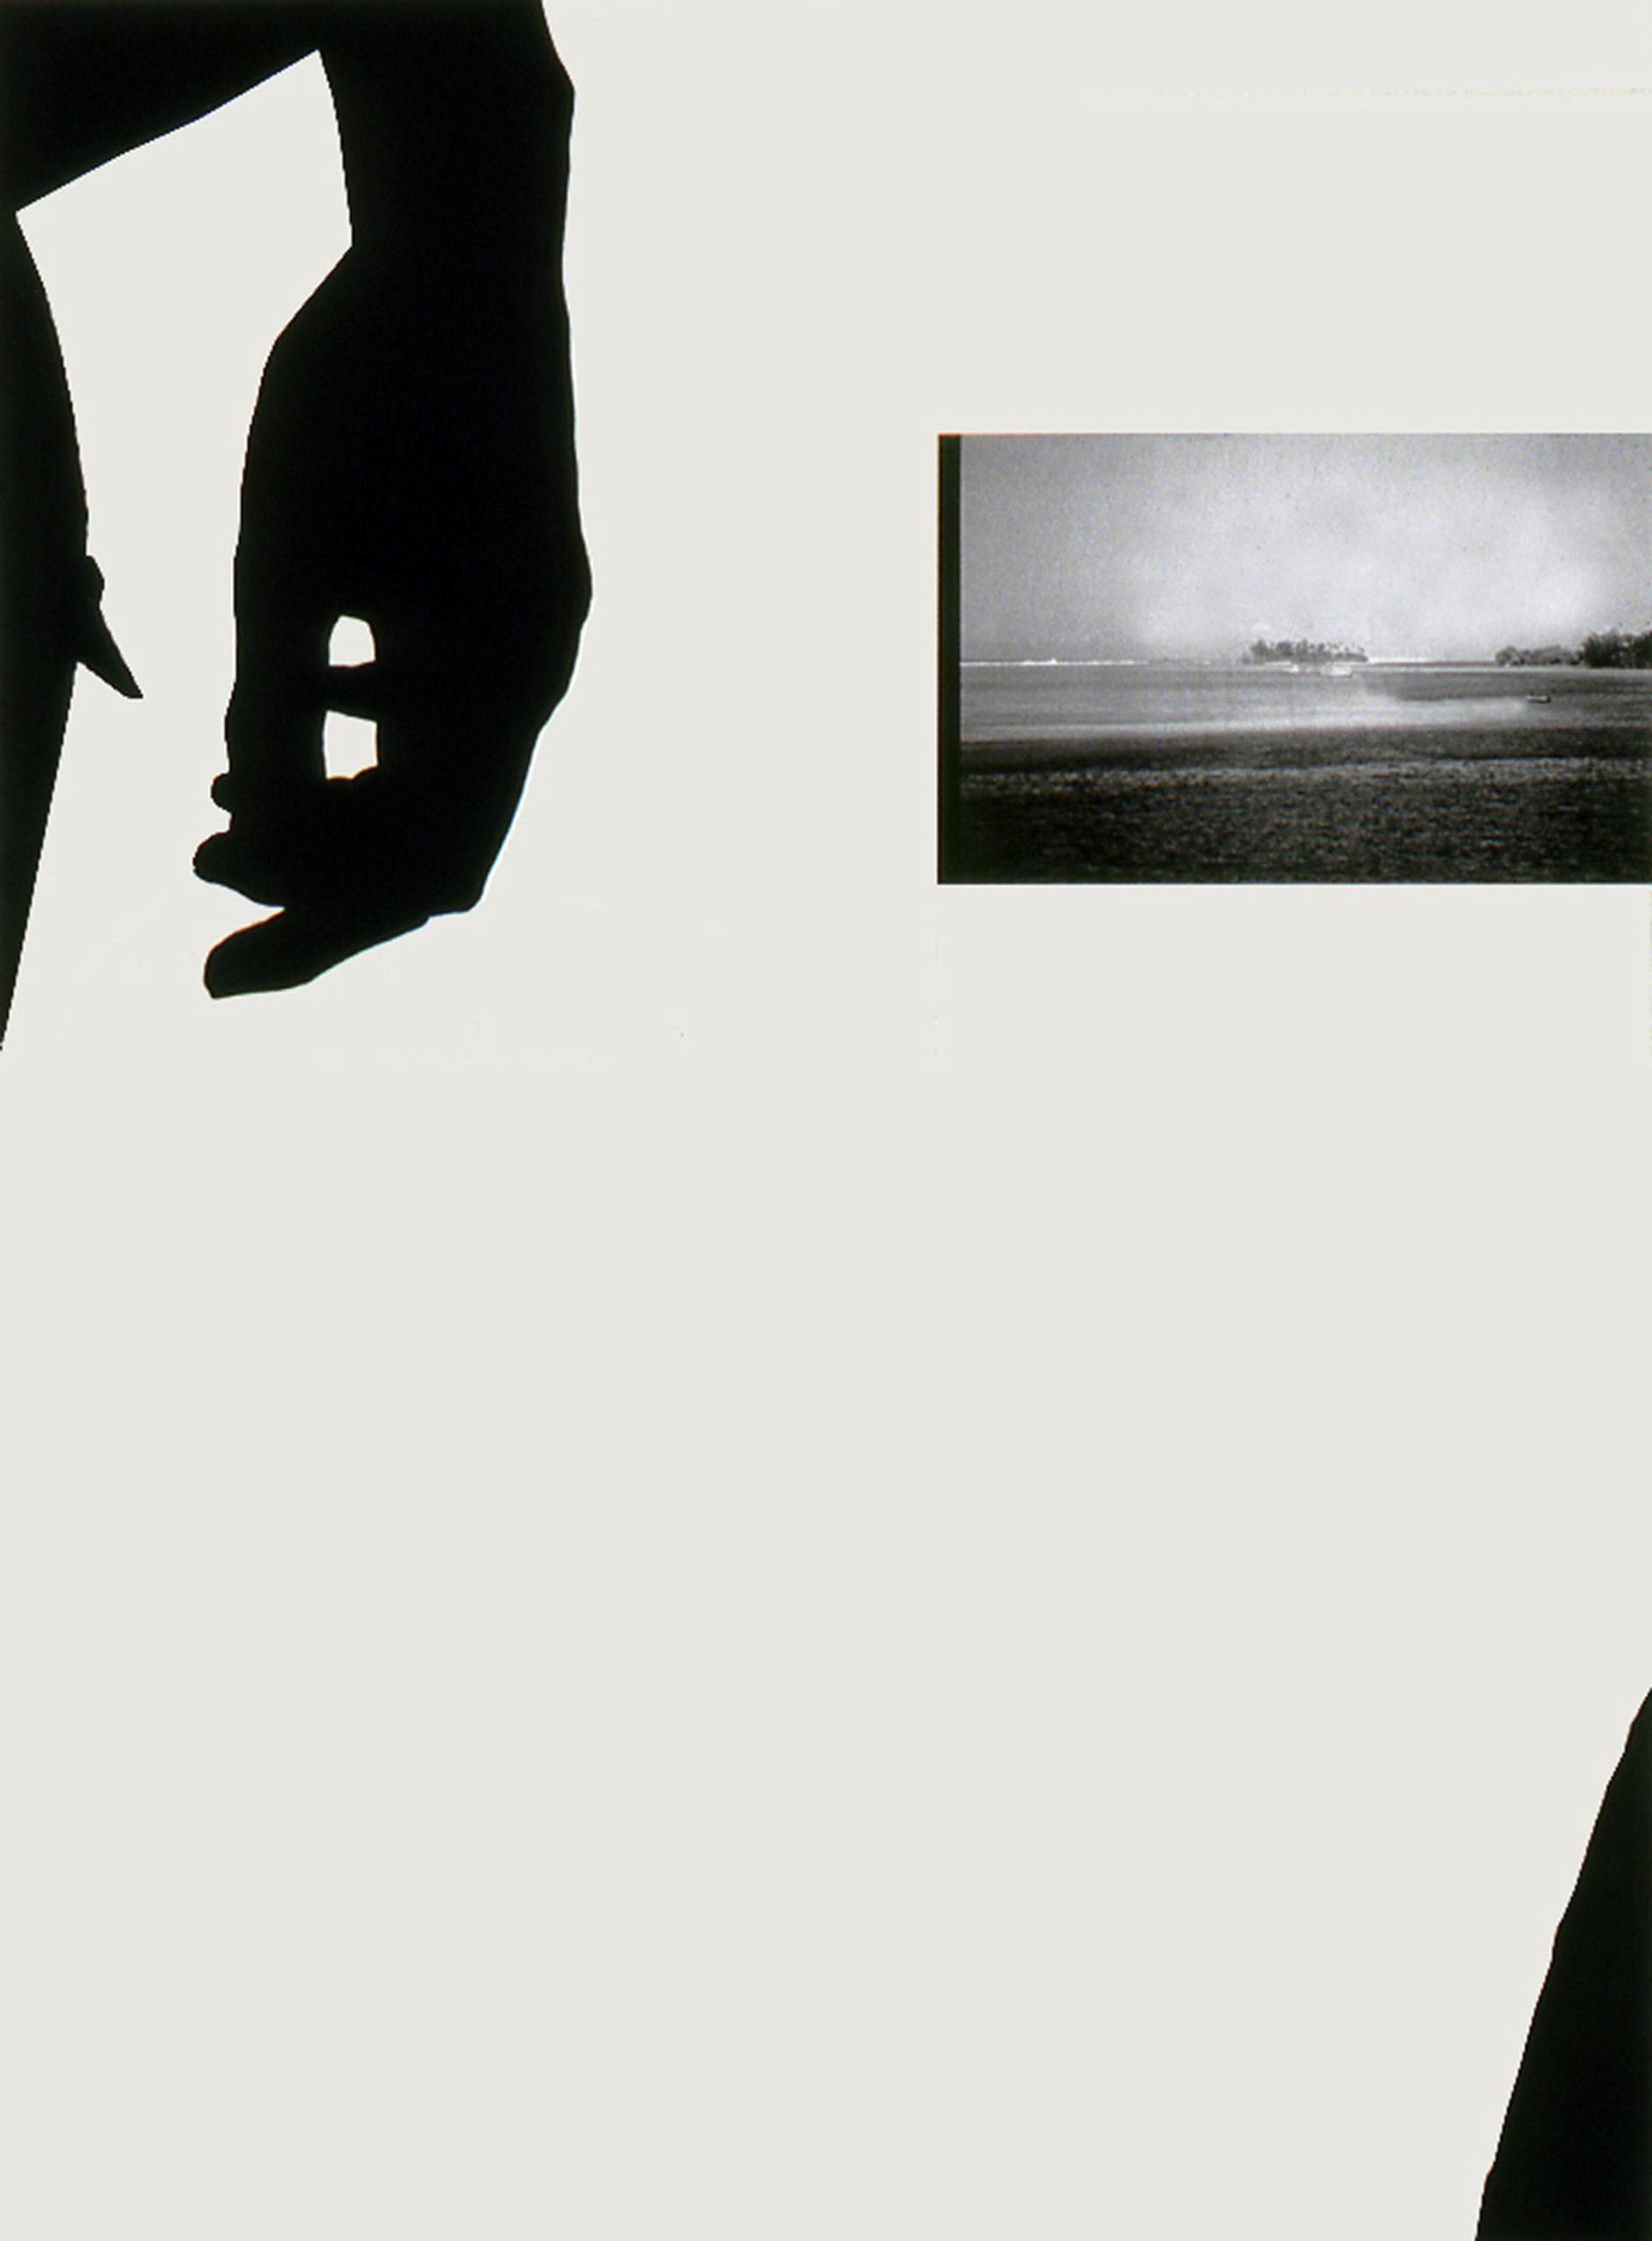 Domestic Isolation, 2002